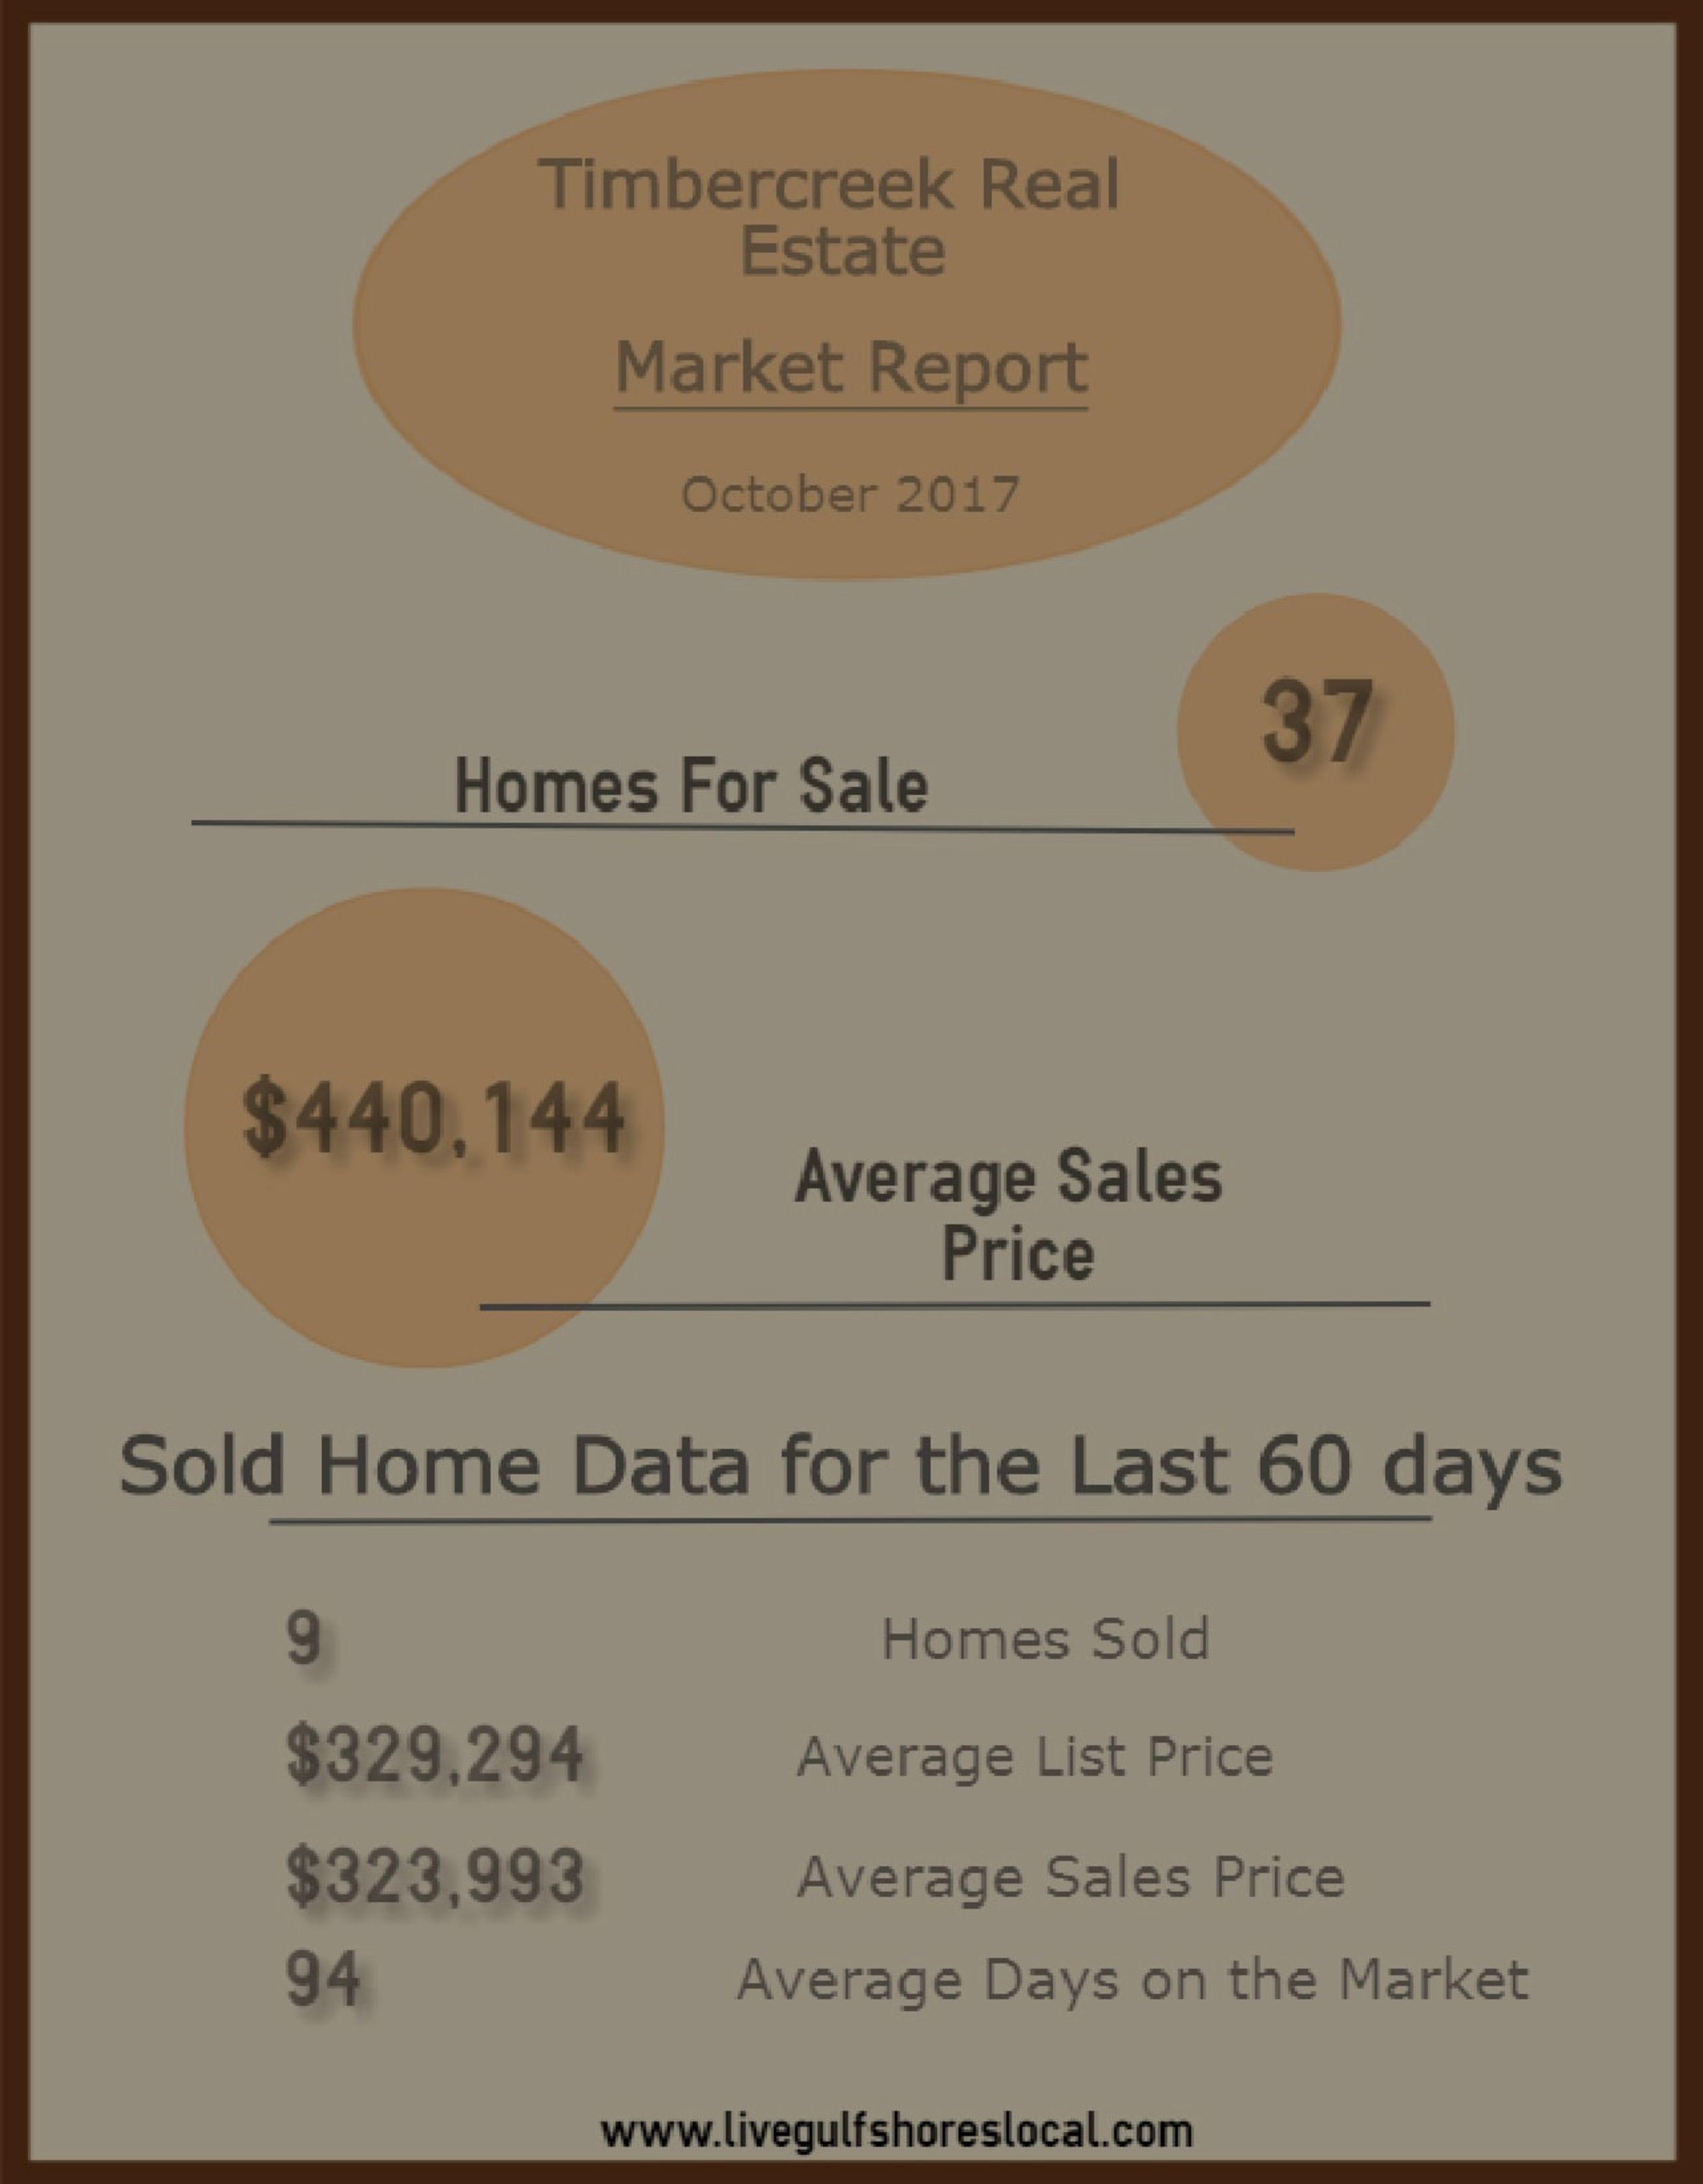 Timbercreek Real Estate Market Update – Oct 2017